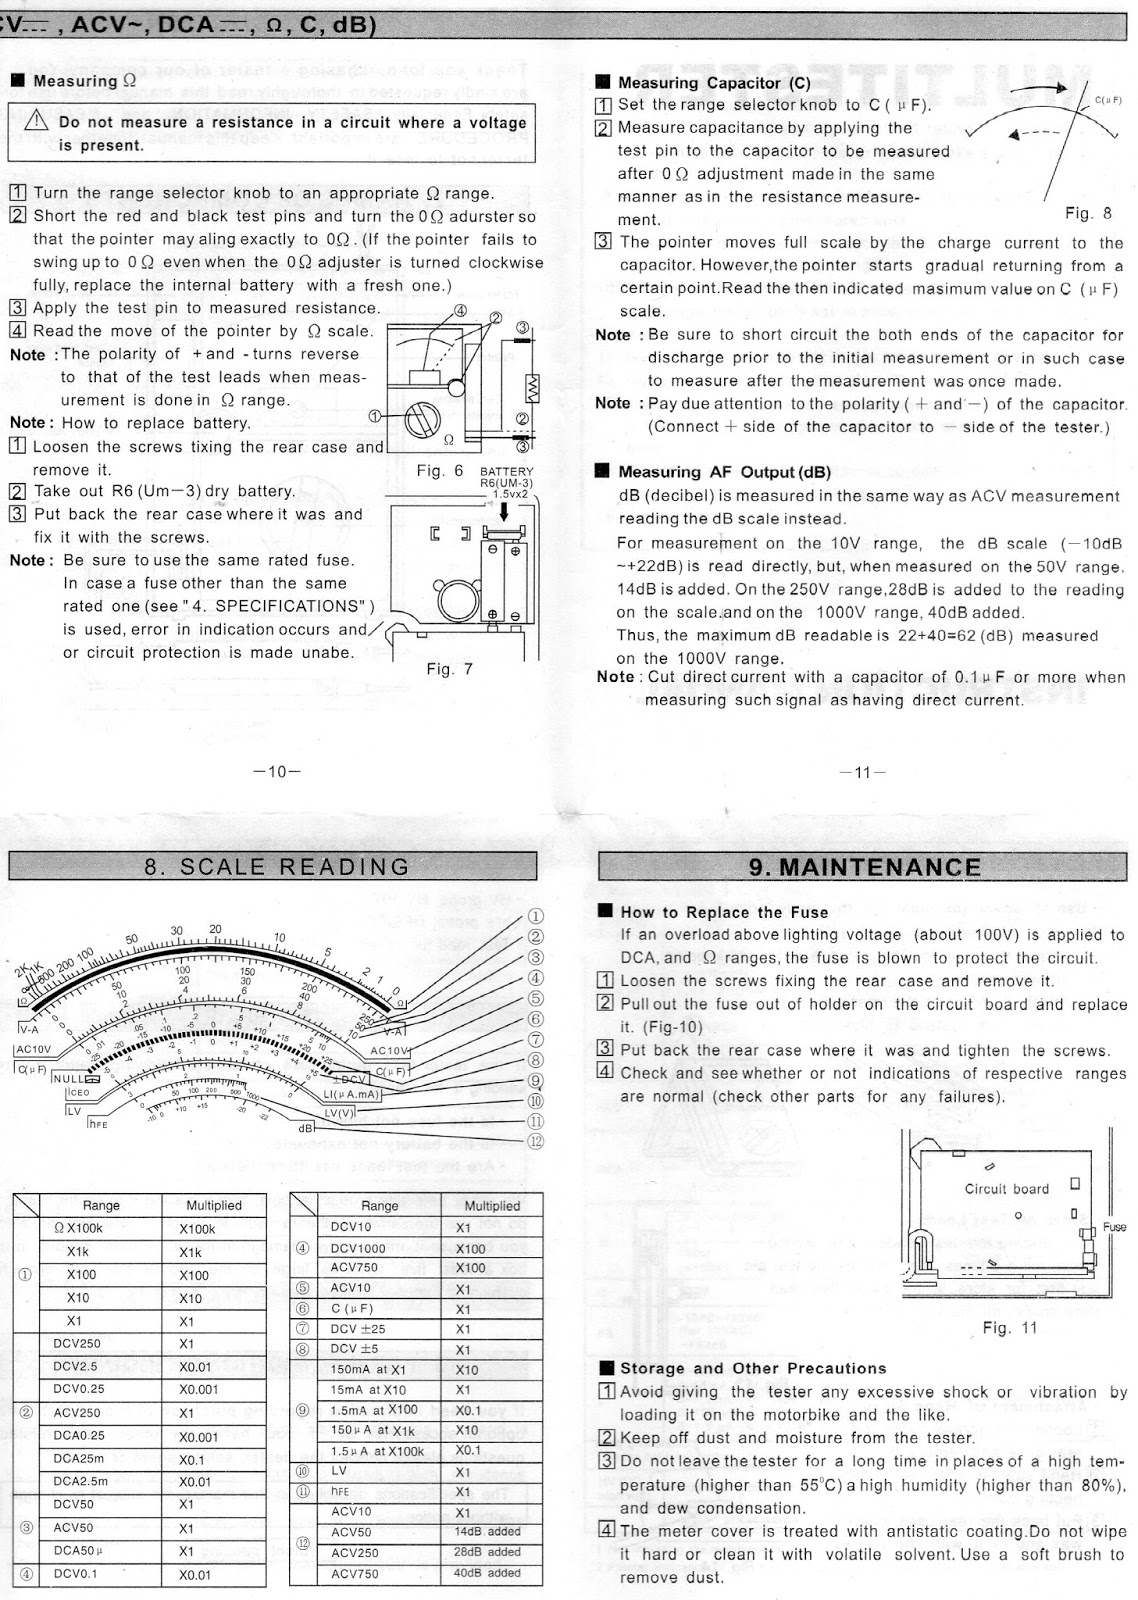 small resolution of empire builder digitrax wiring diagram